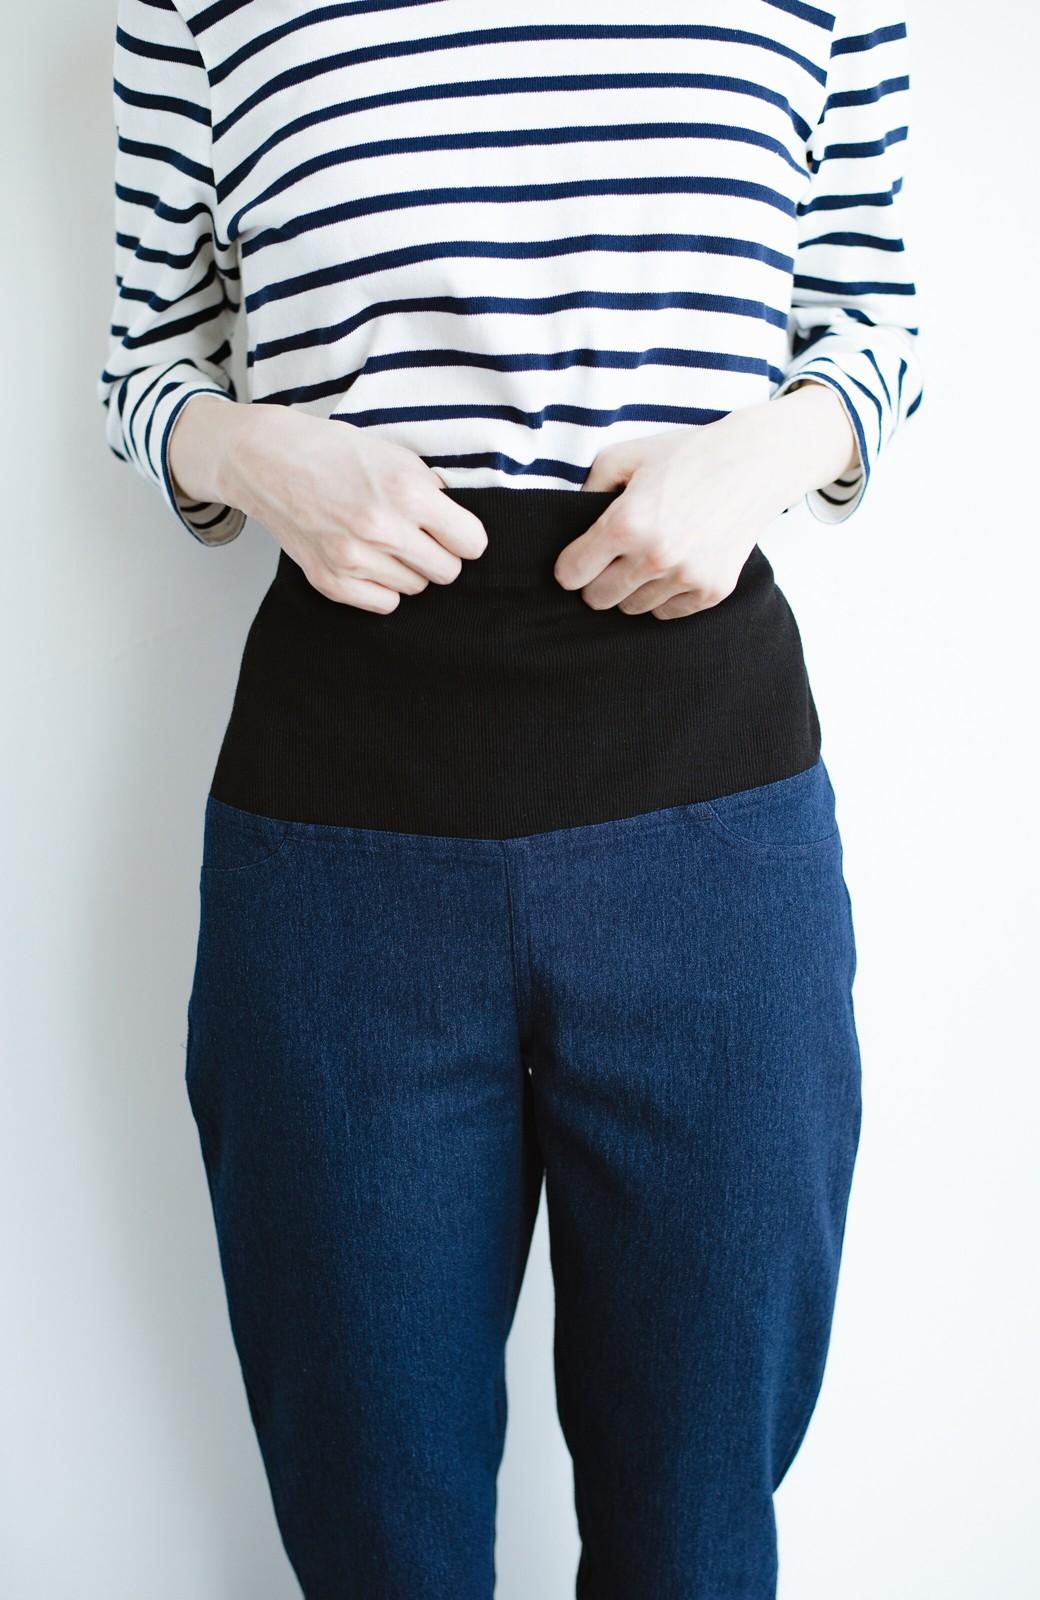 haco! おなかあったか安心感スキニーパンツ【ブルー期】女の子バンザイ!プロジェクト <ダークインディゴブルー>の商品写真8